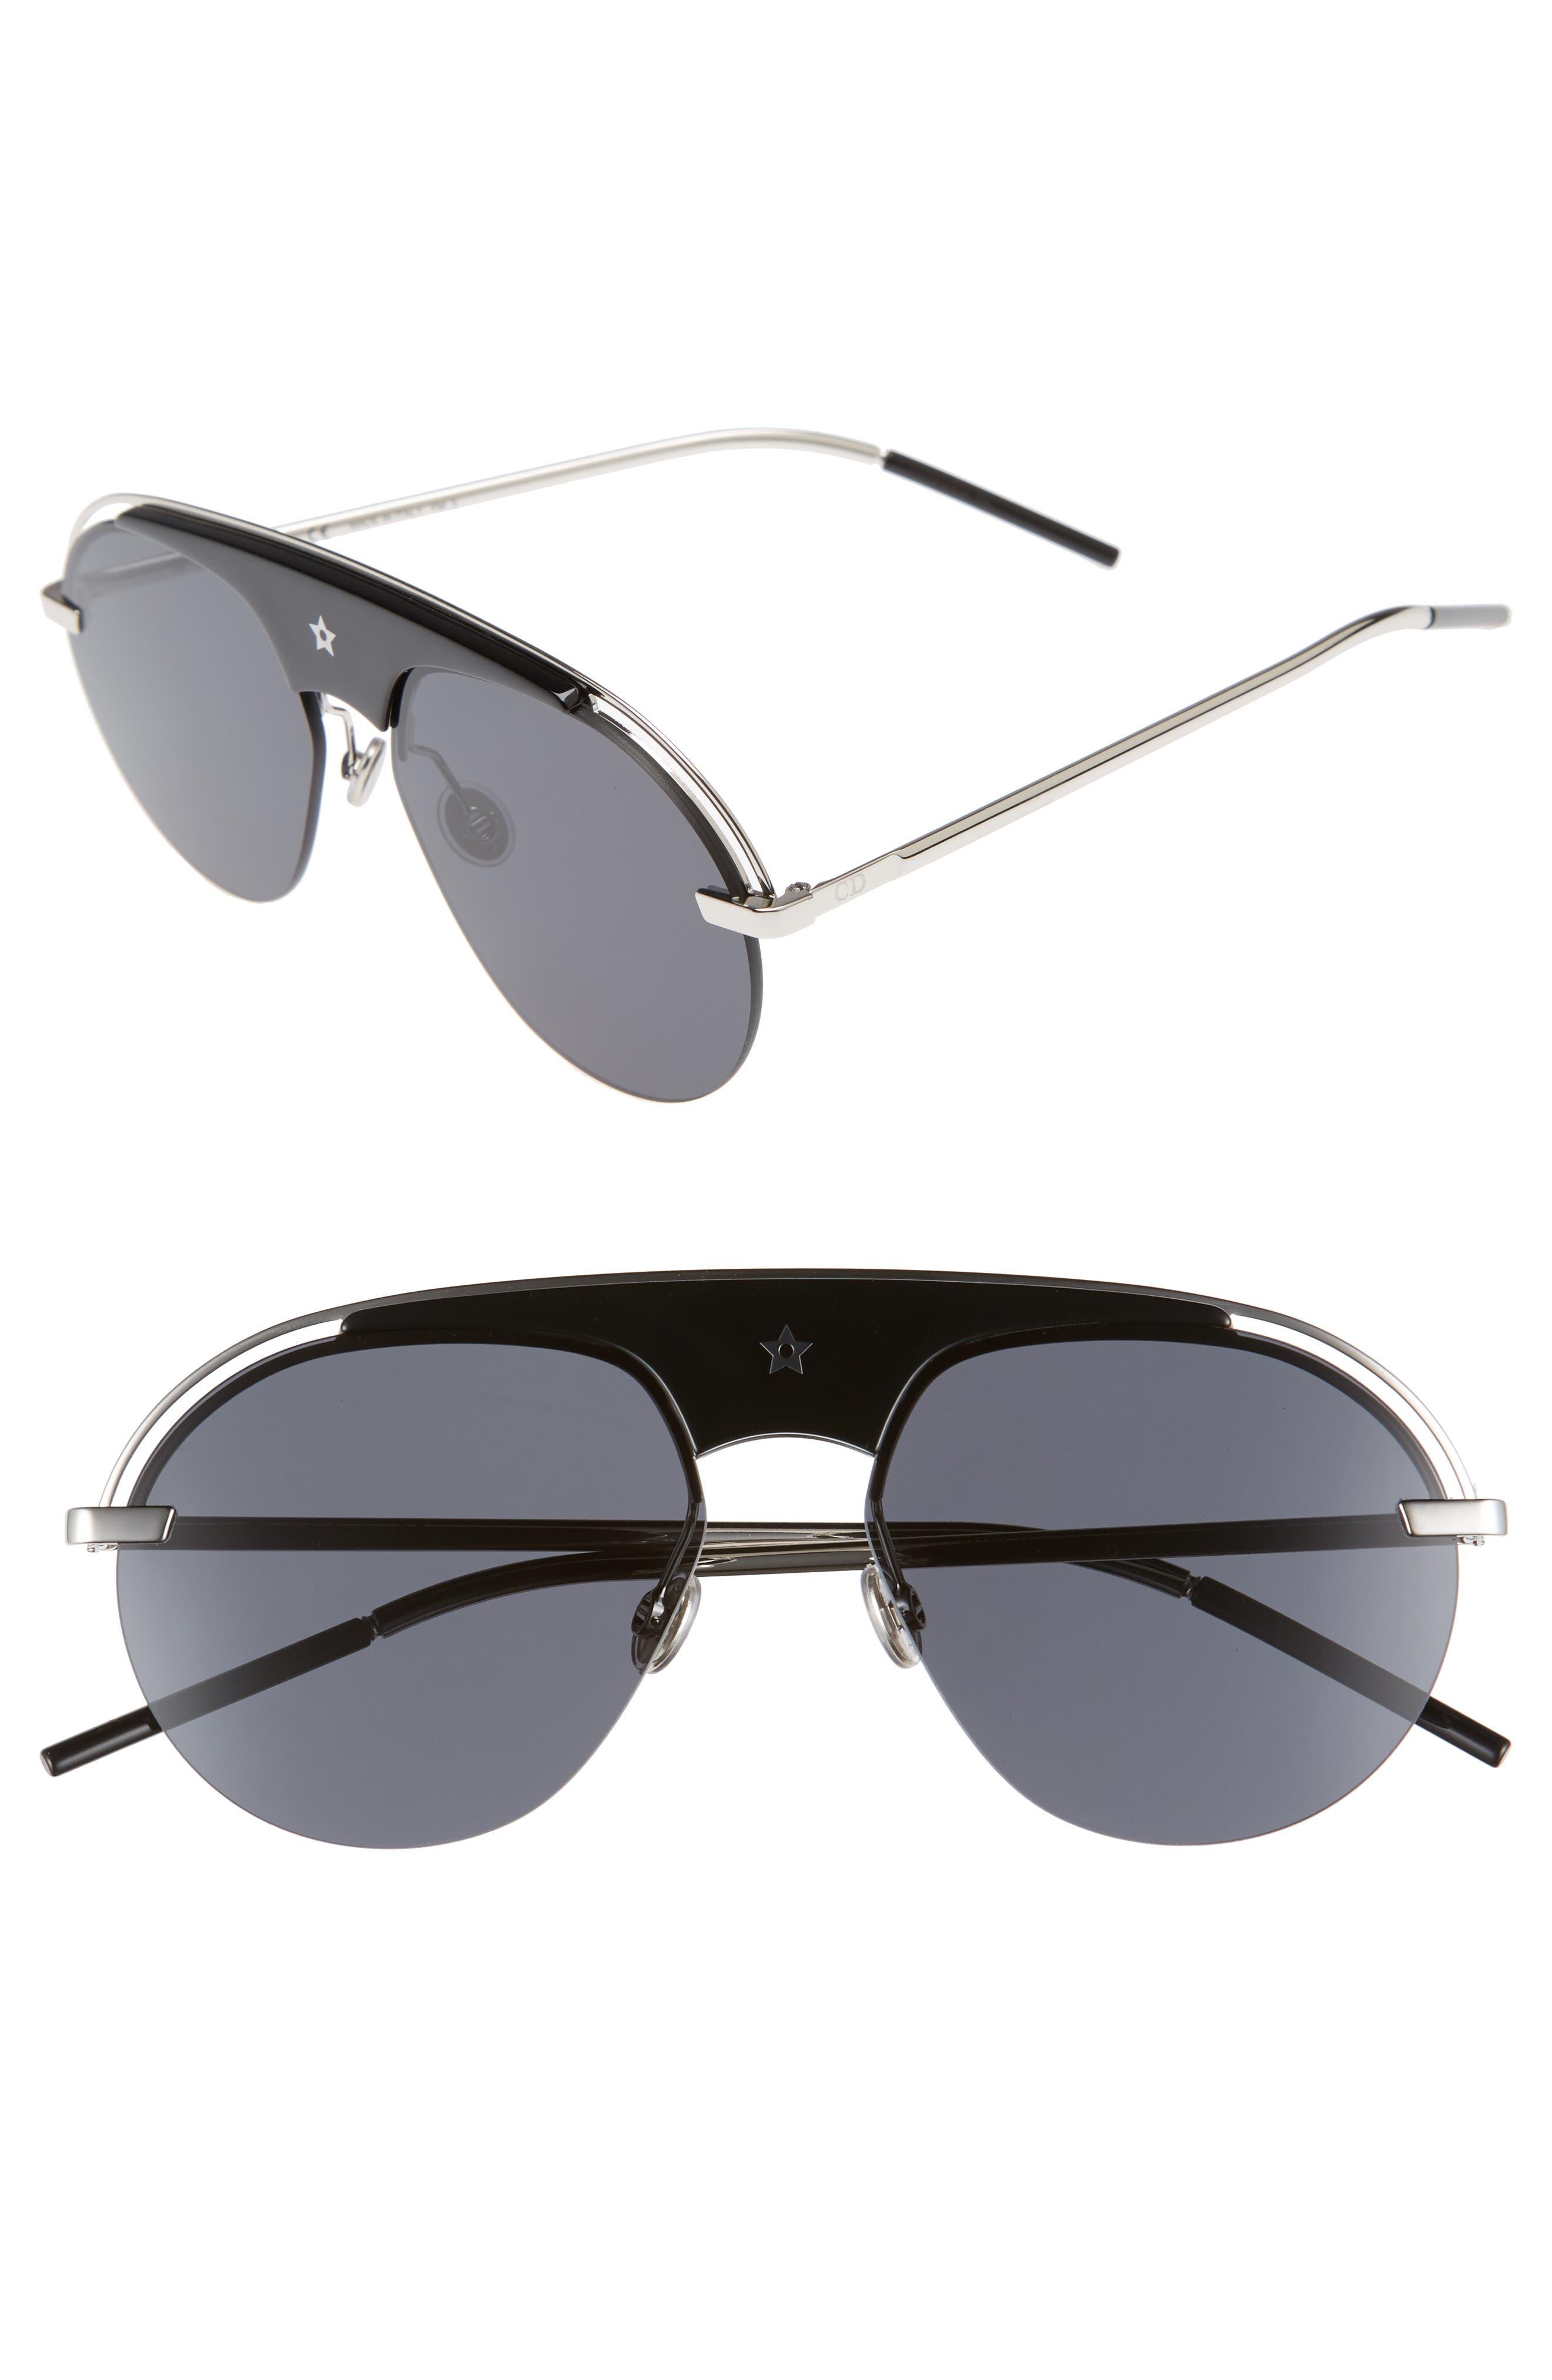 Revolution 58mm Aviator Sunglasses,                         Main,                         color, 001